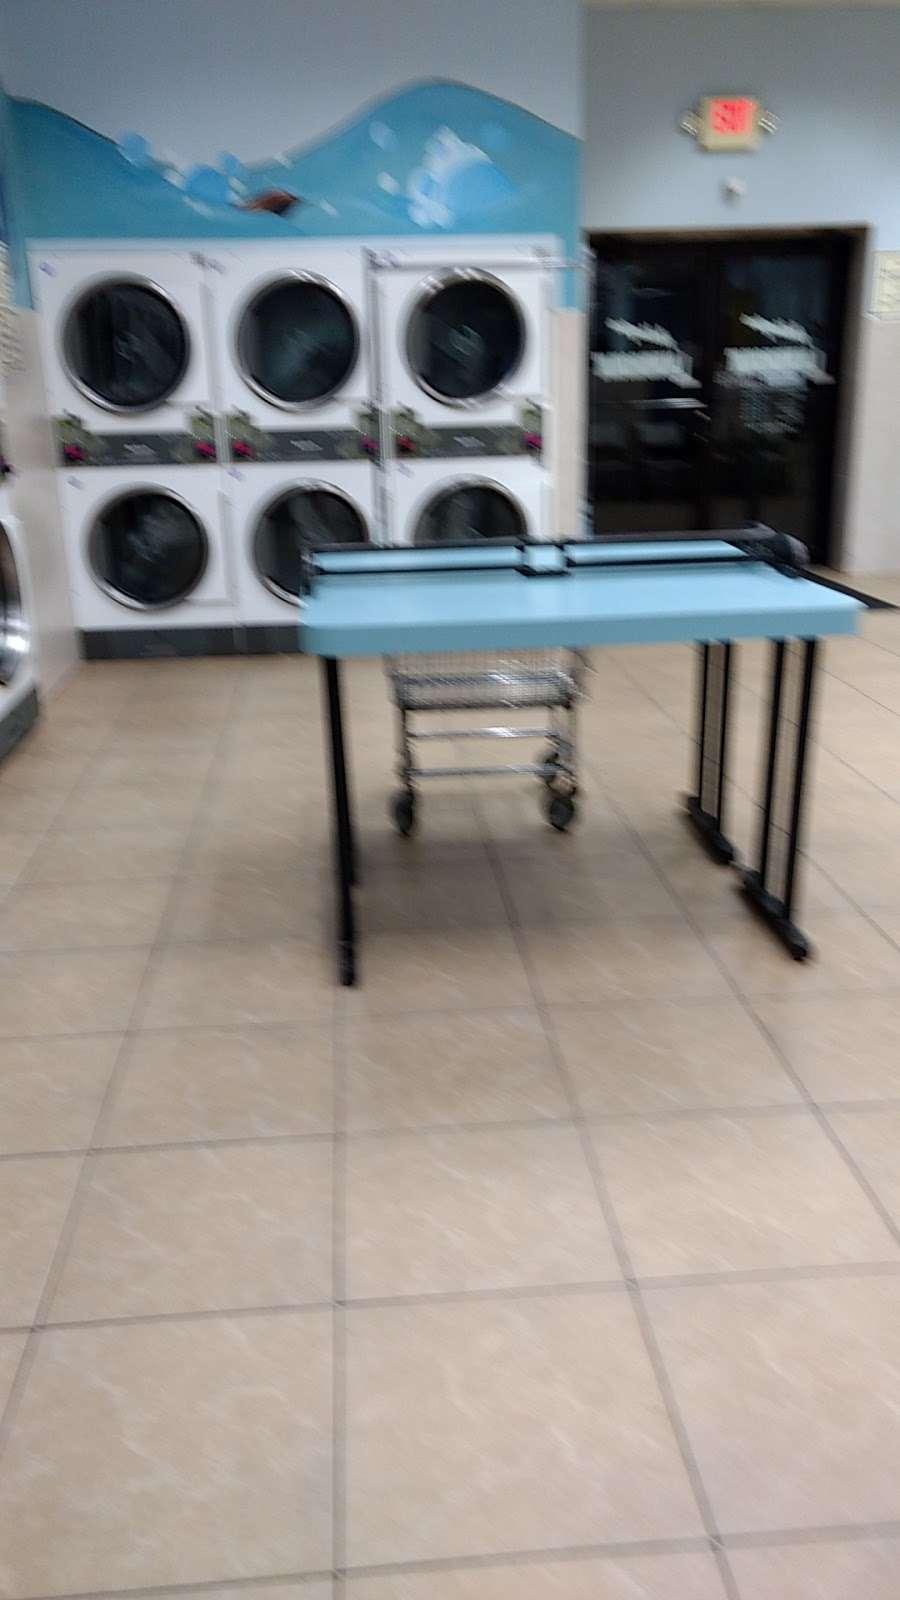 Arlington Laundromat - laundry  | Photo 5 of 5 | Address: 493 Ridge Rd, North Arlington, NJ 07031, USA | Phone: (201) 997-5757